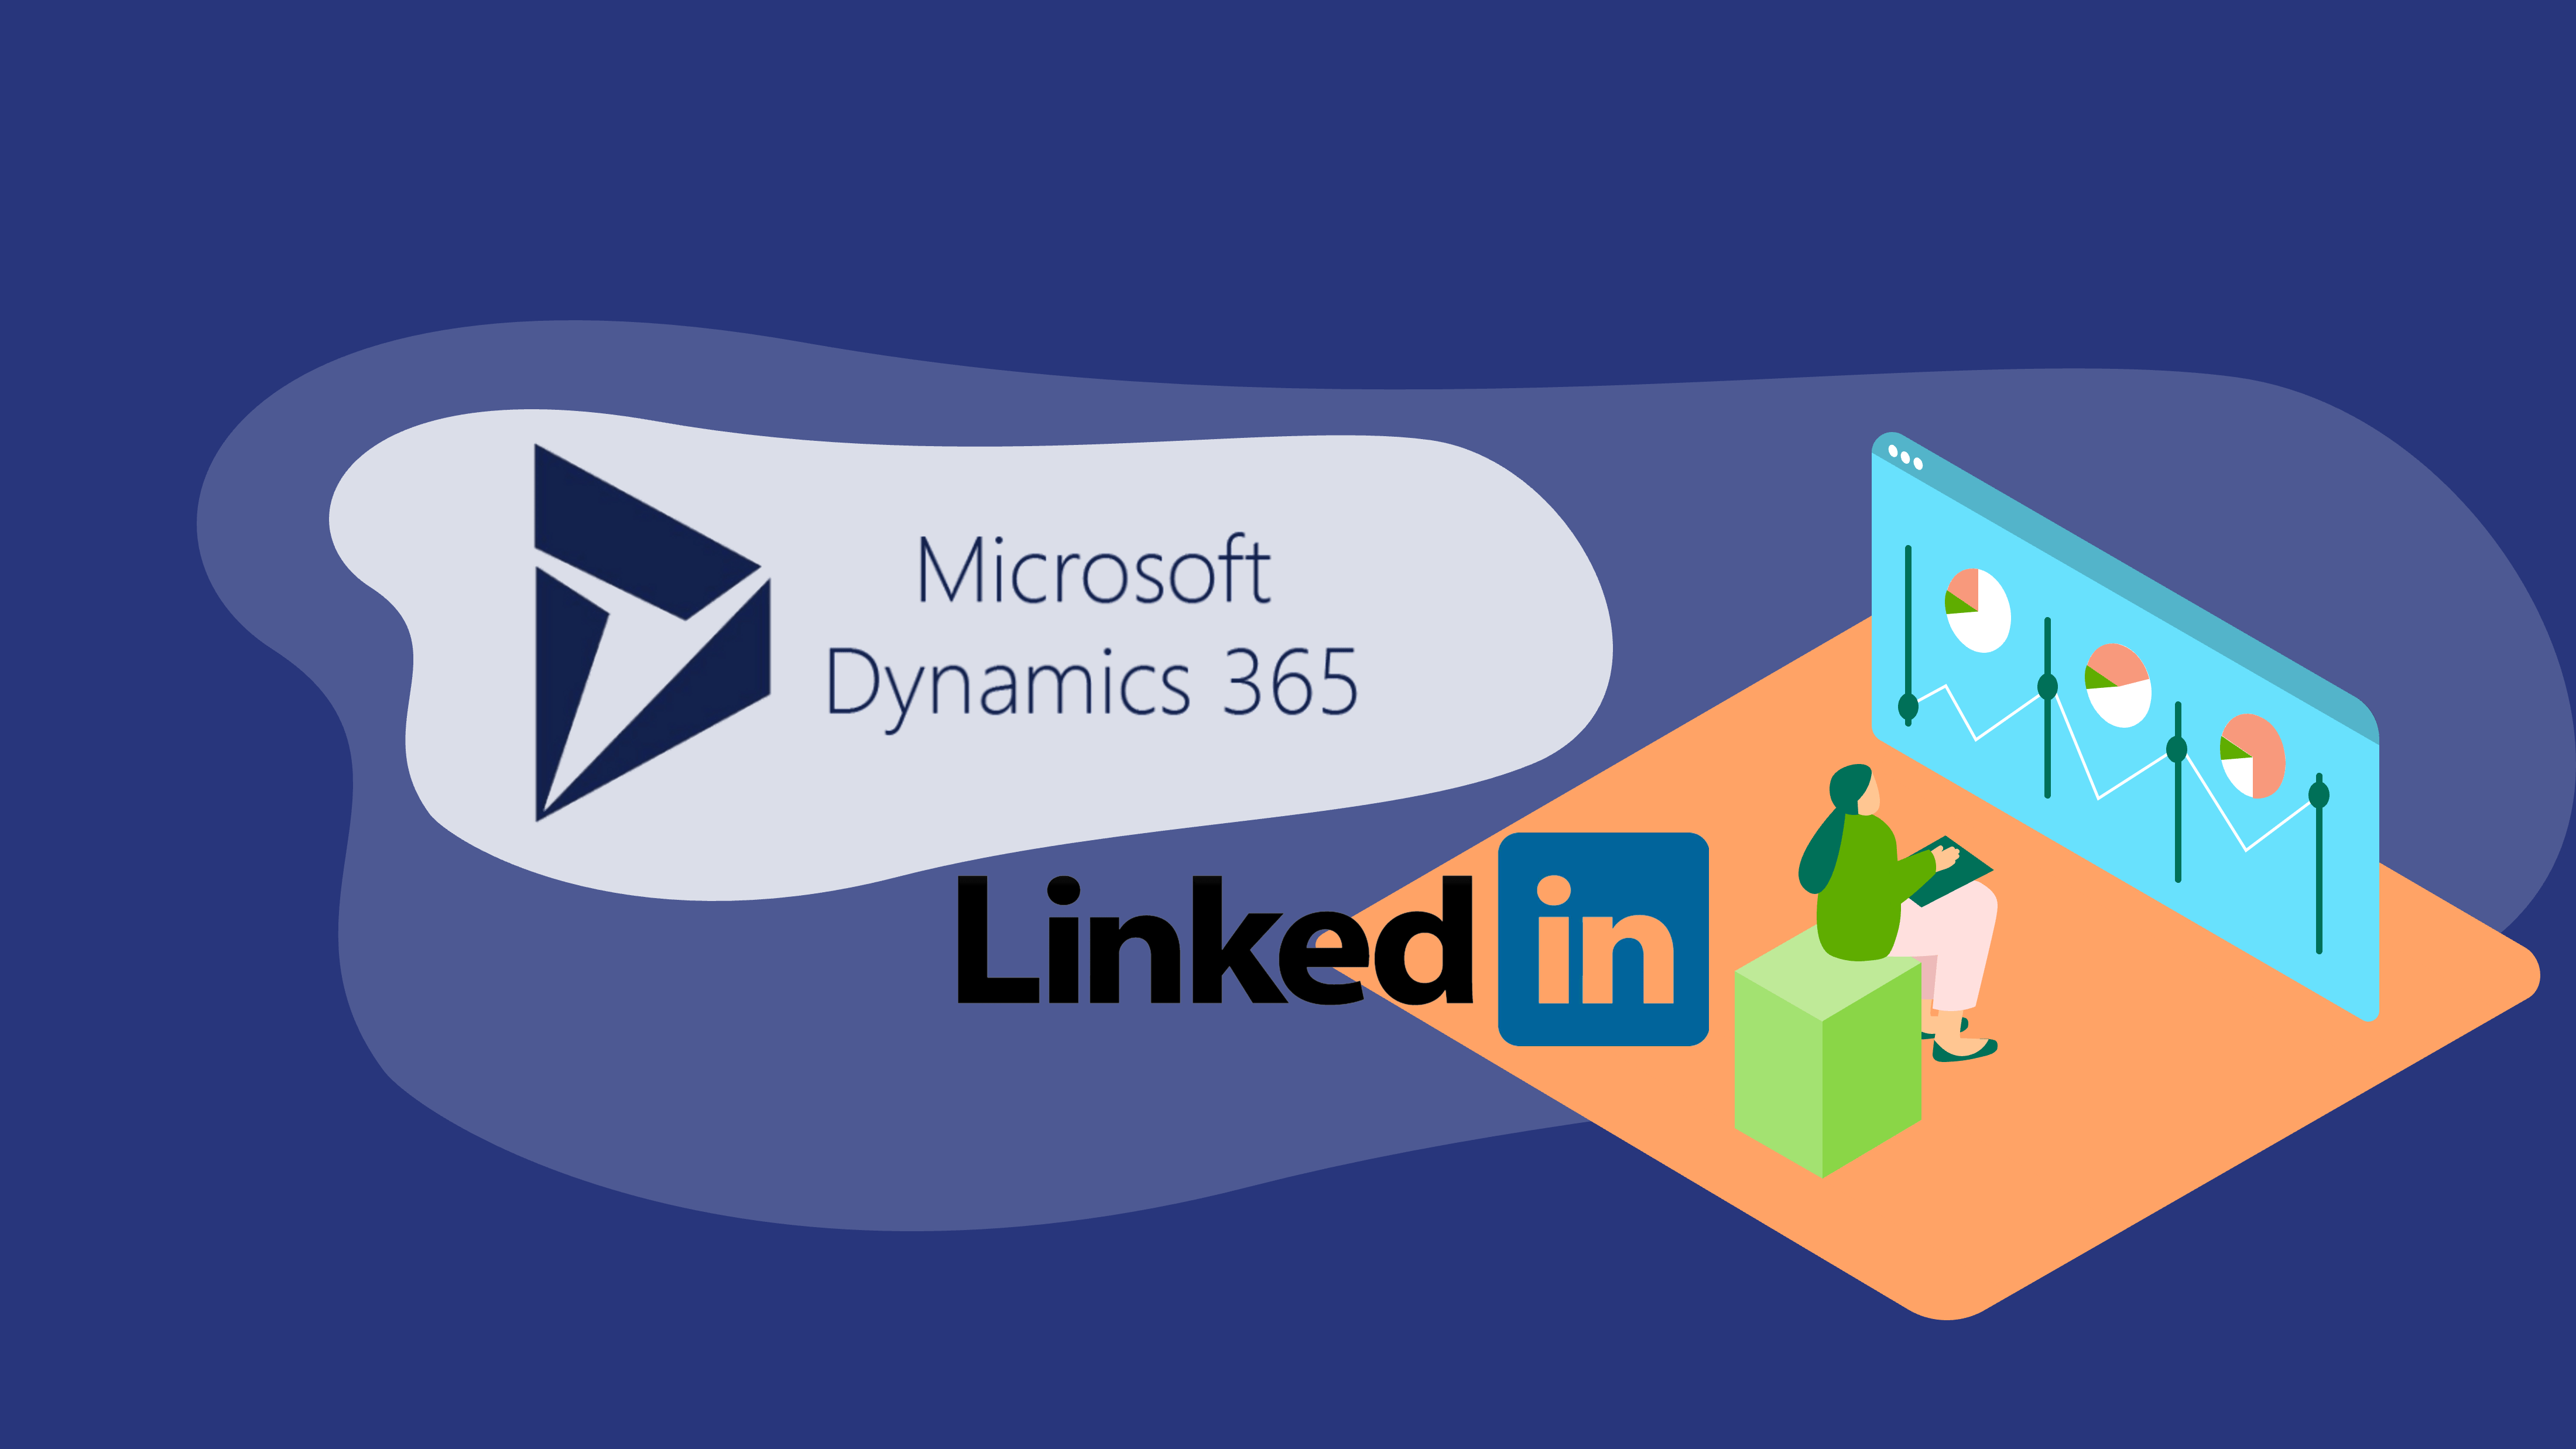 Statistiche 2018 Vendite digitali, Social Selling, CRM – Statistiche 2018 LinkedIn